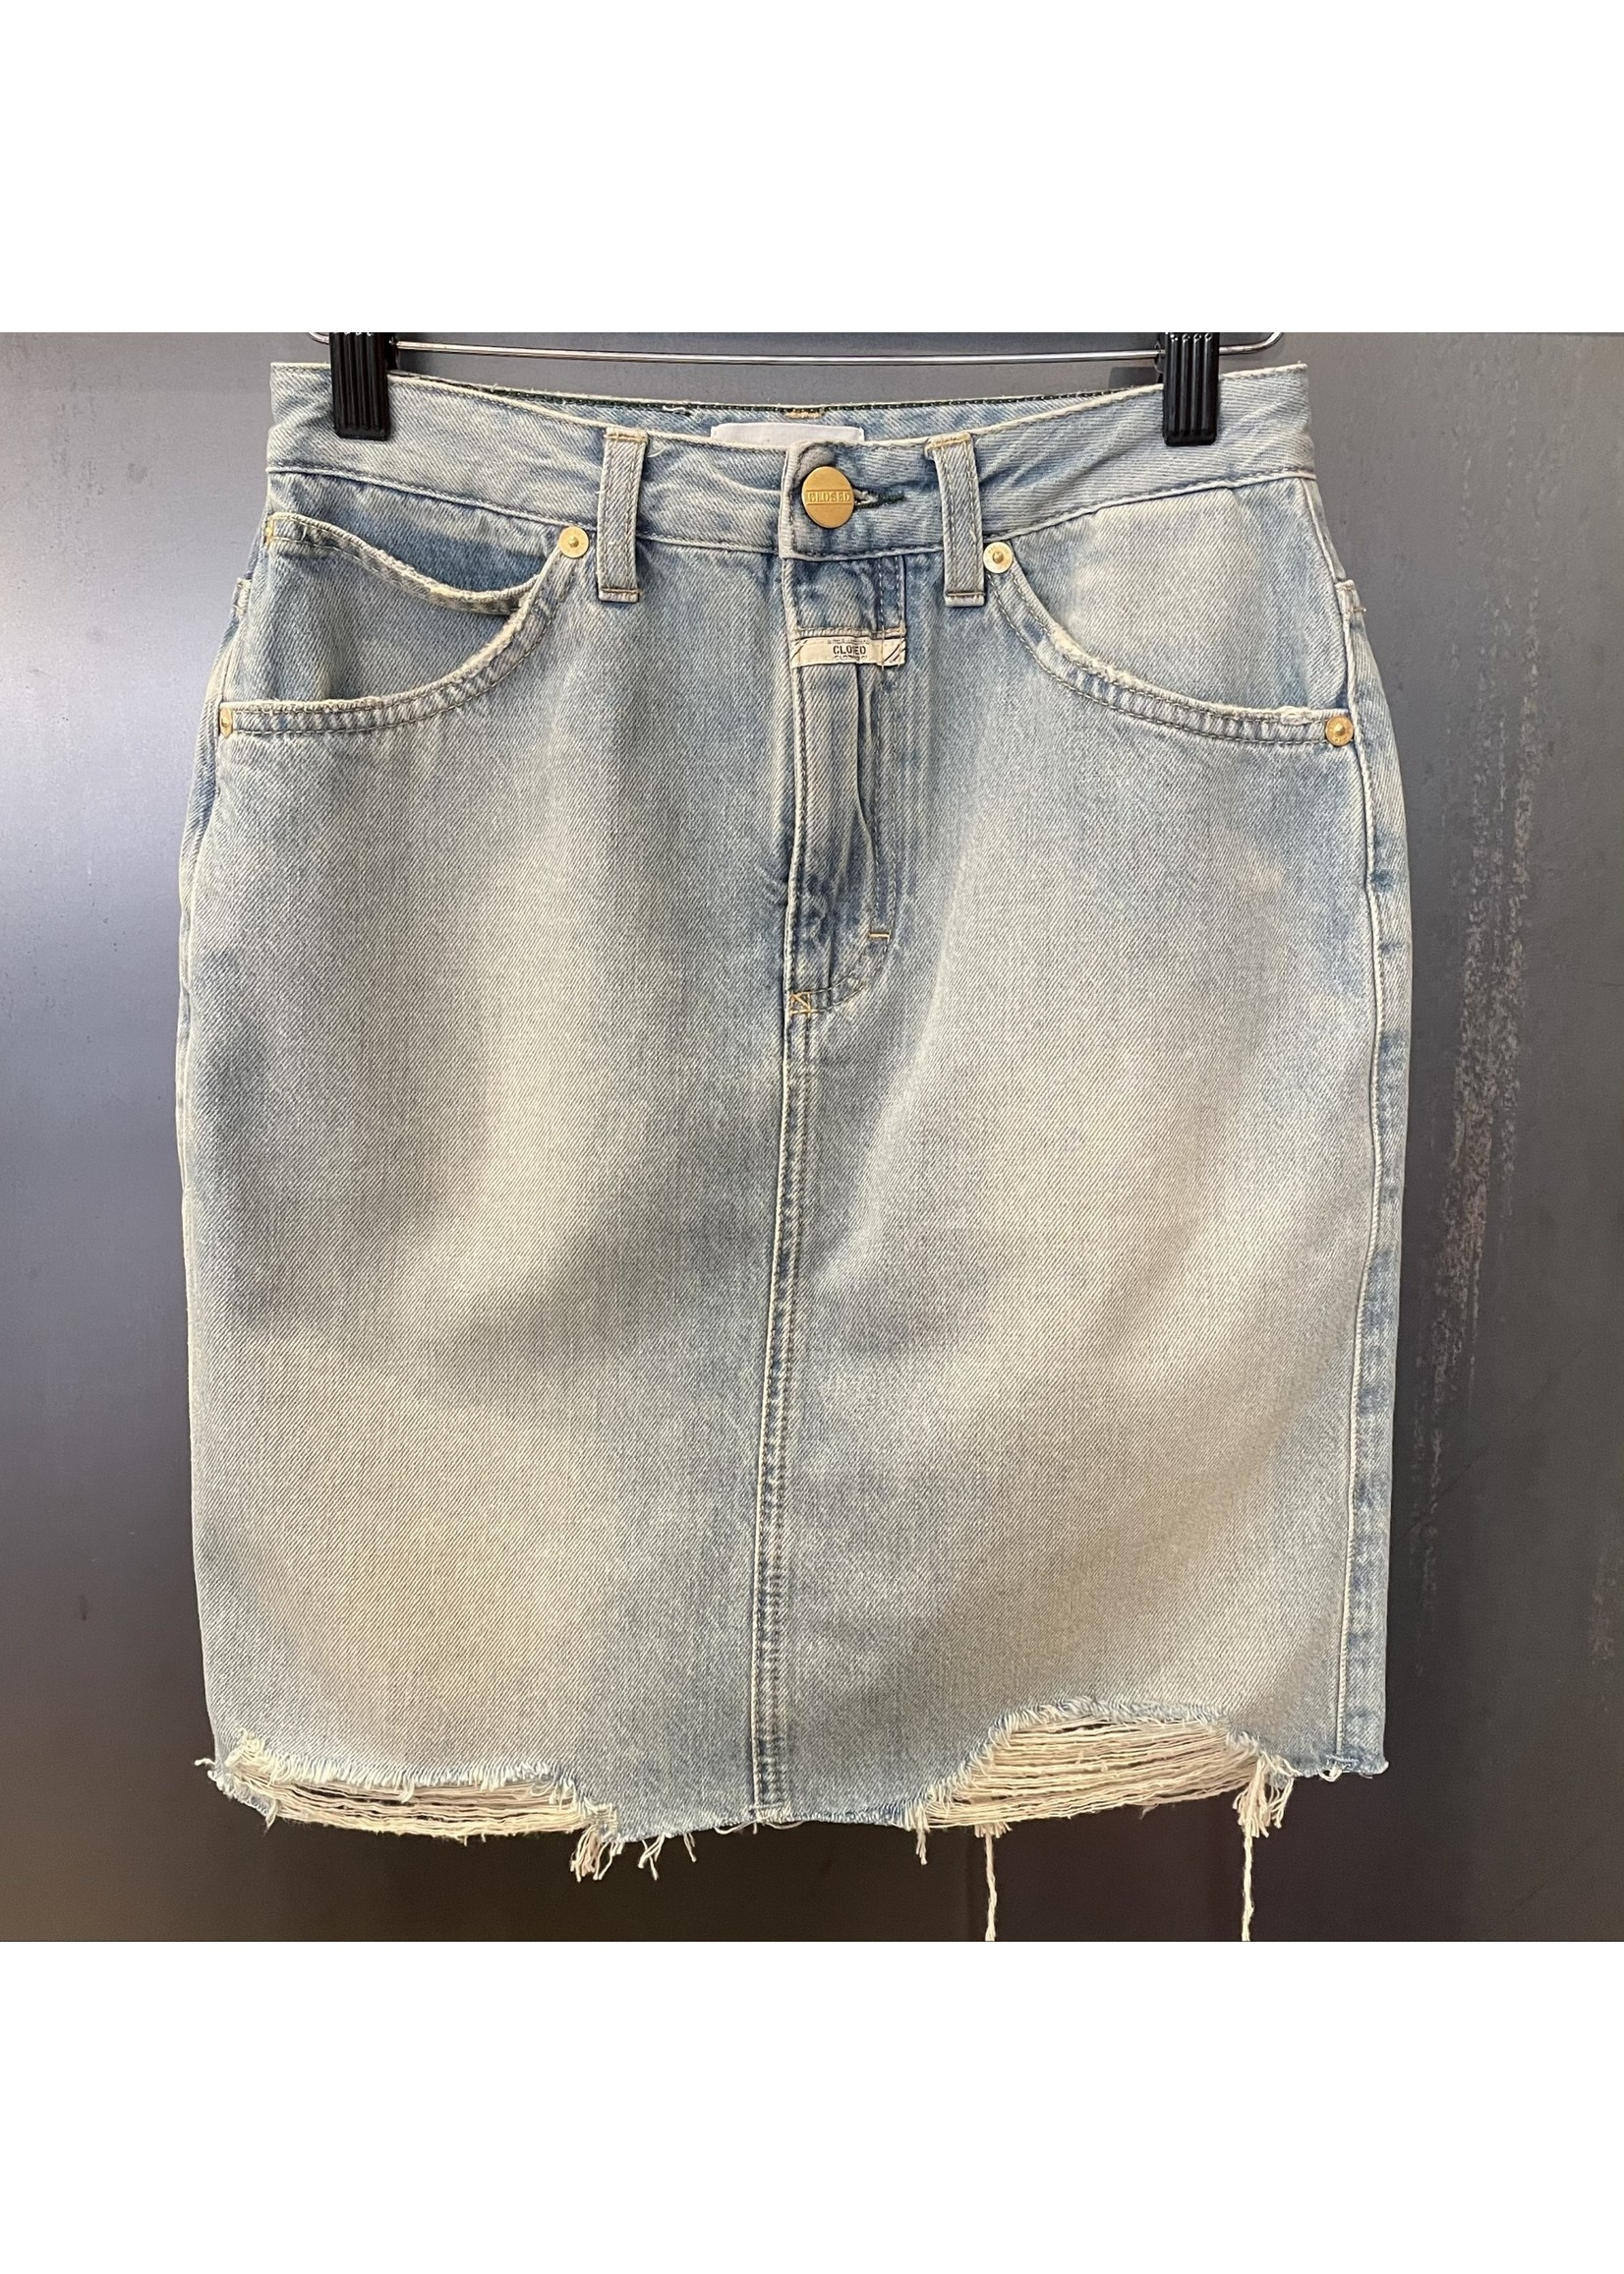 Closed Closed Denim Skirt